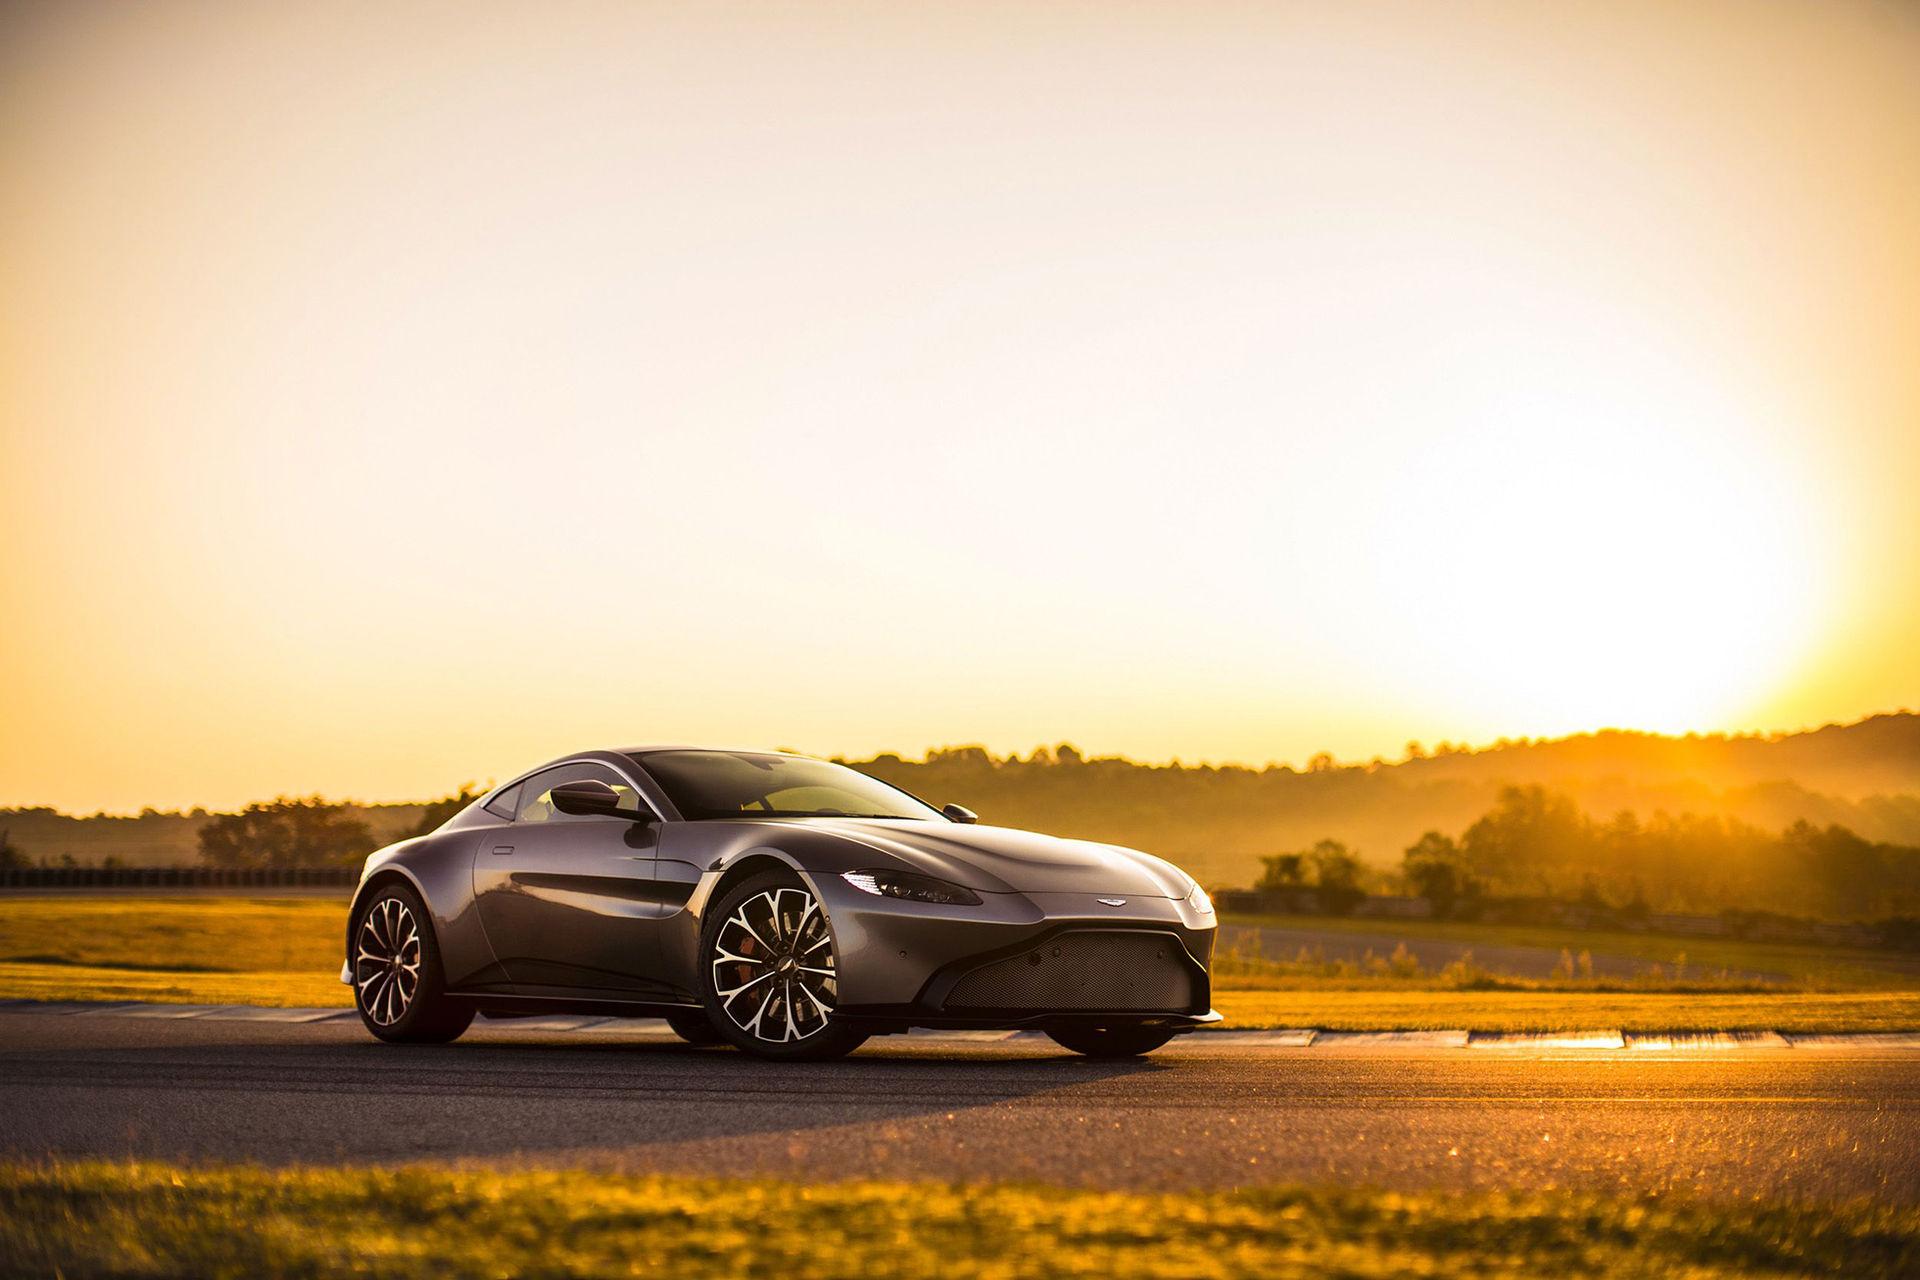 Aston Martin rullar ut helt nya Vantage